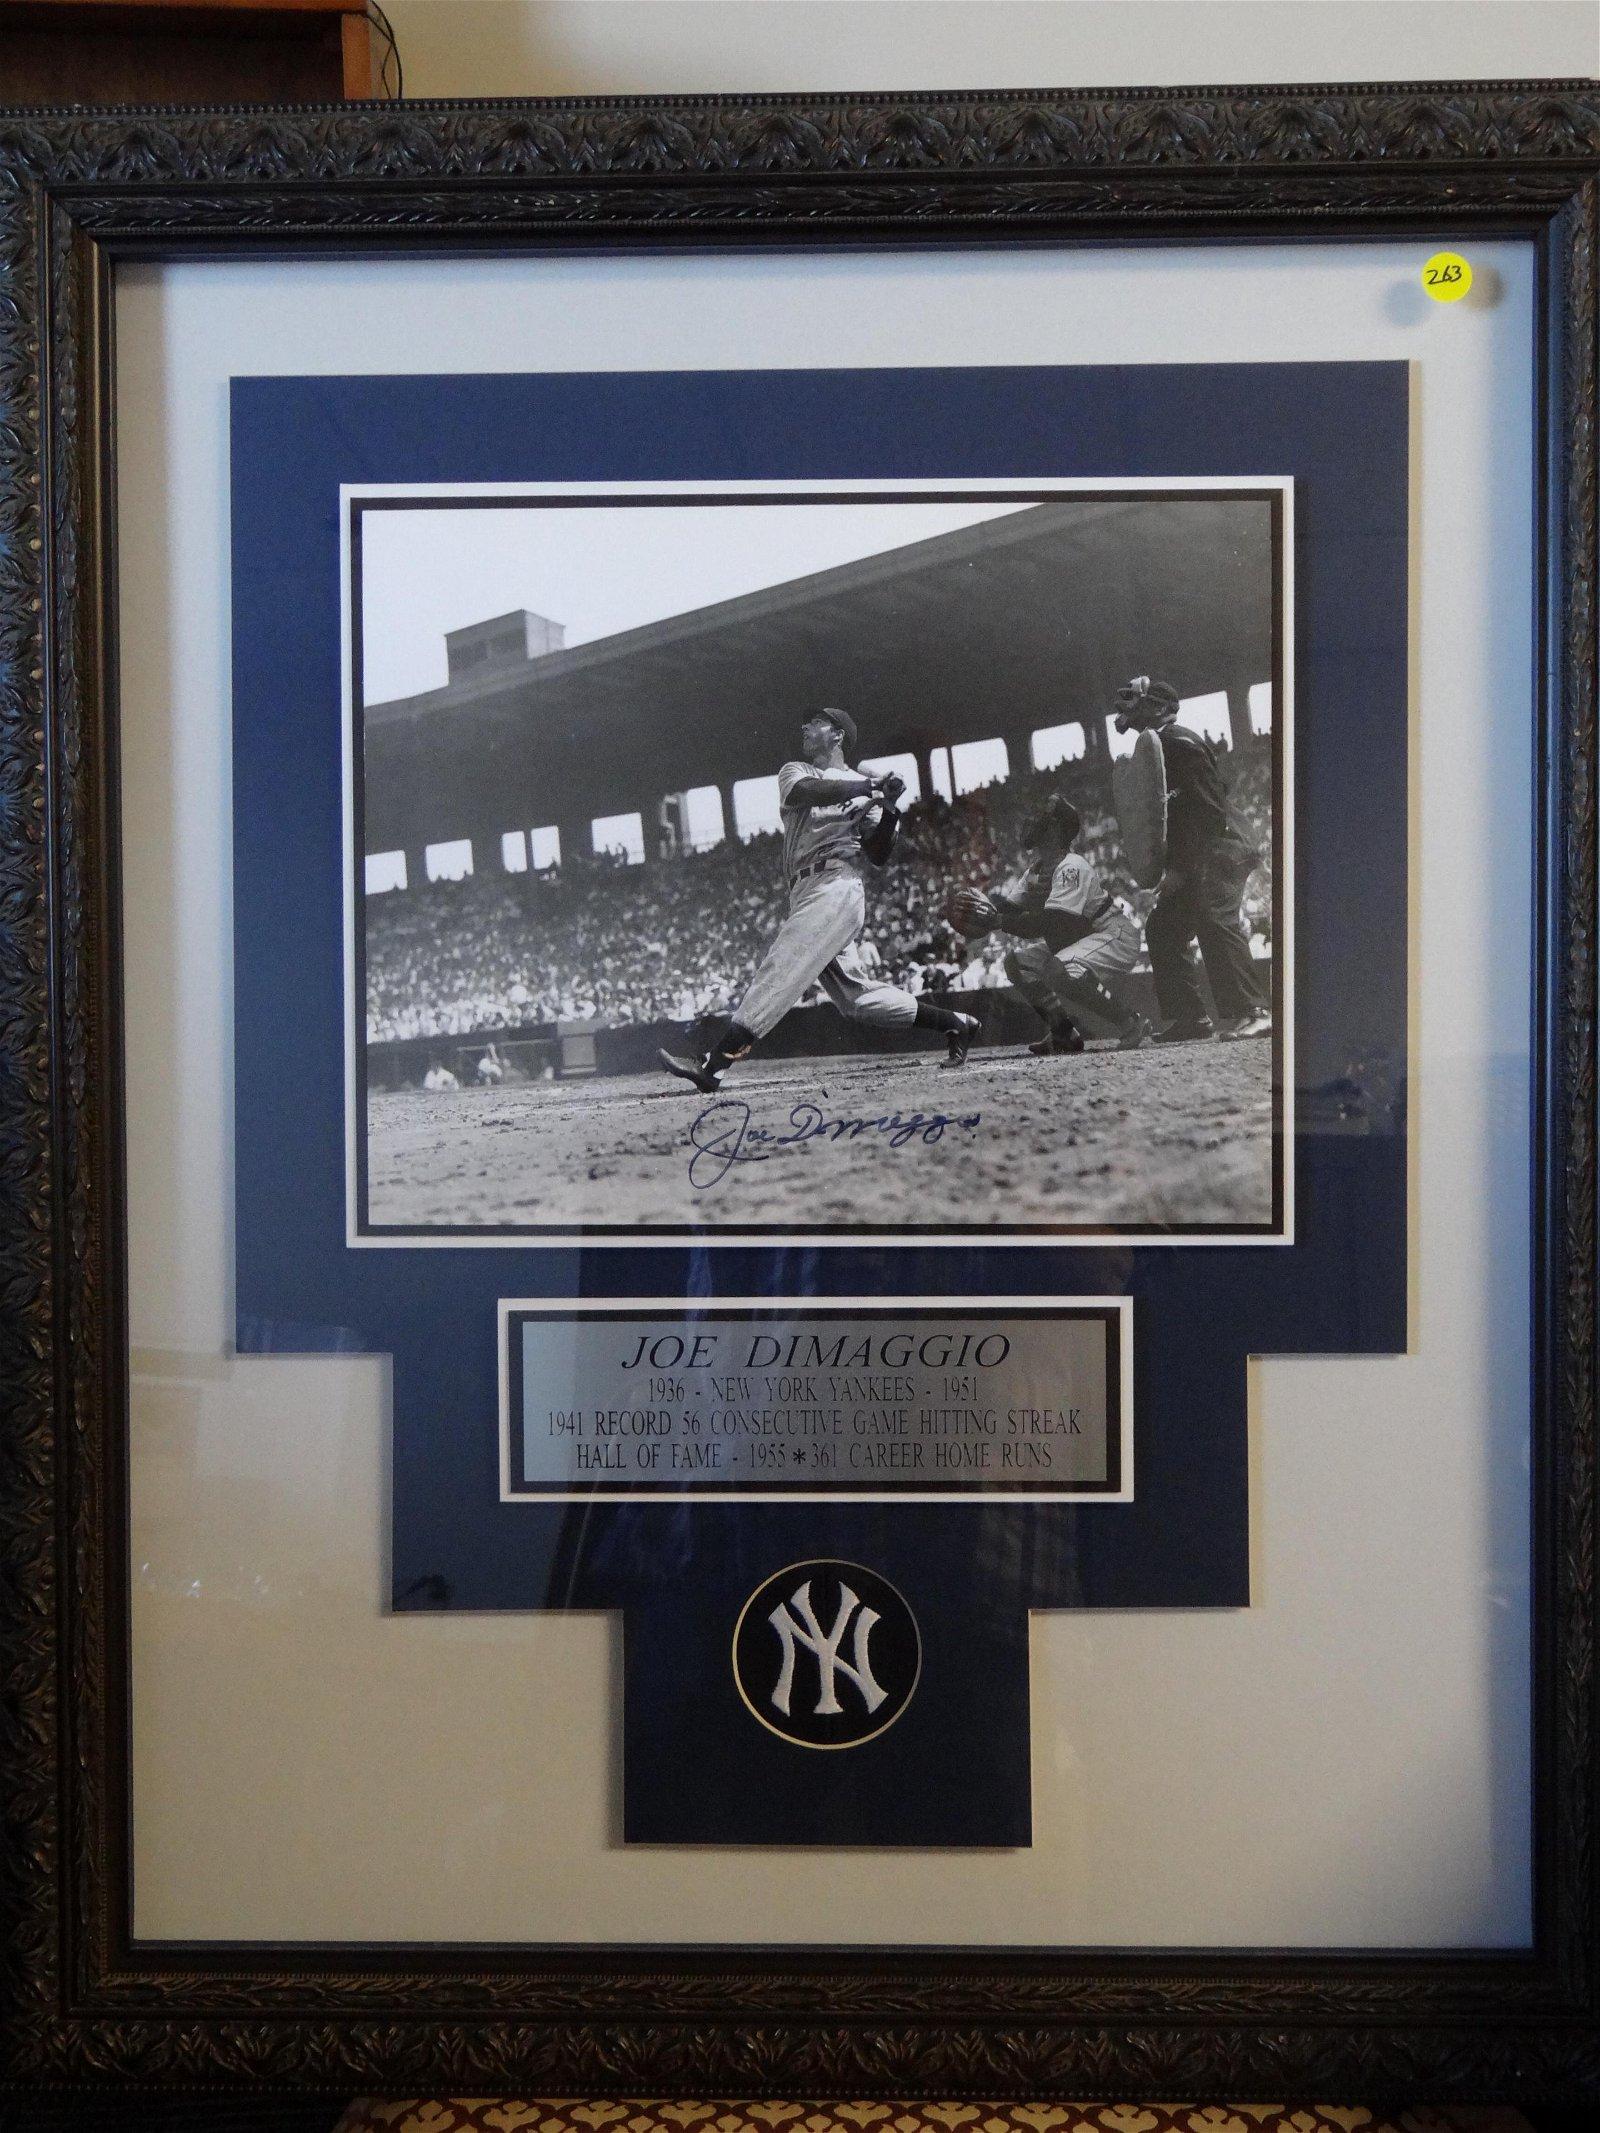 "Joe DiMaggio Signed Photo. Framed 26 1/2"" x 31""."